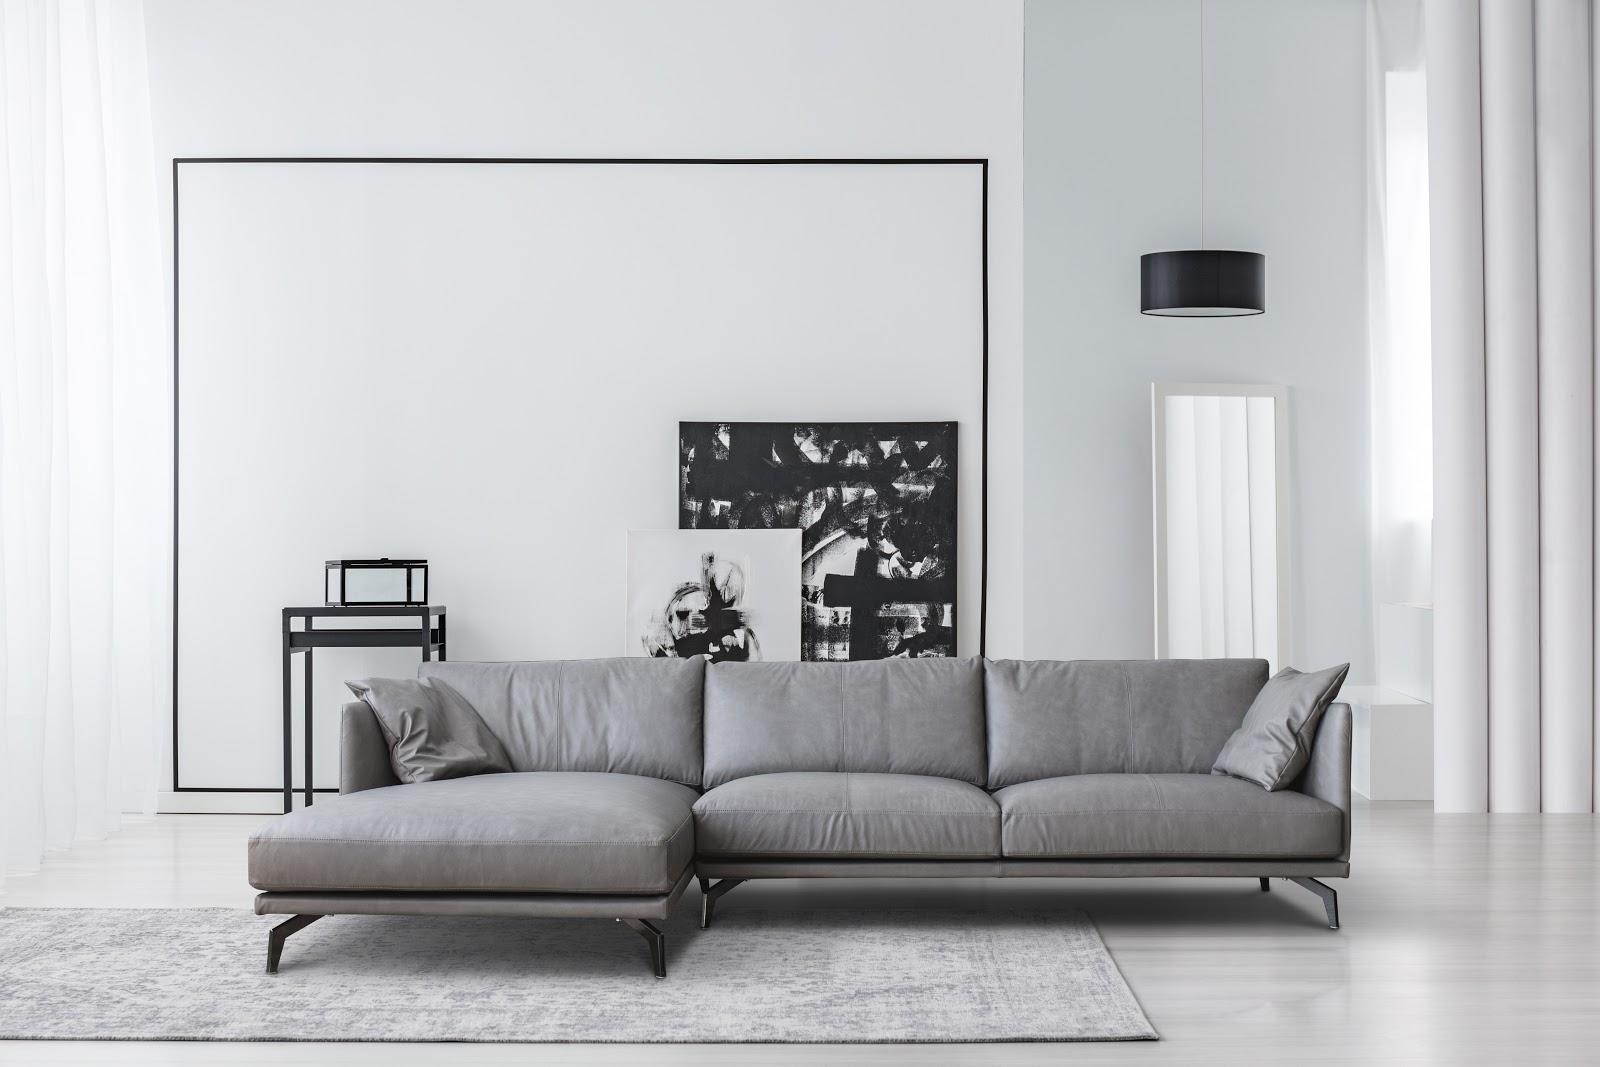 Top 2020 Interior Design Trends